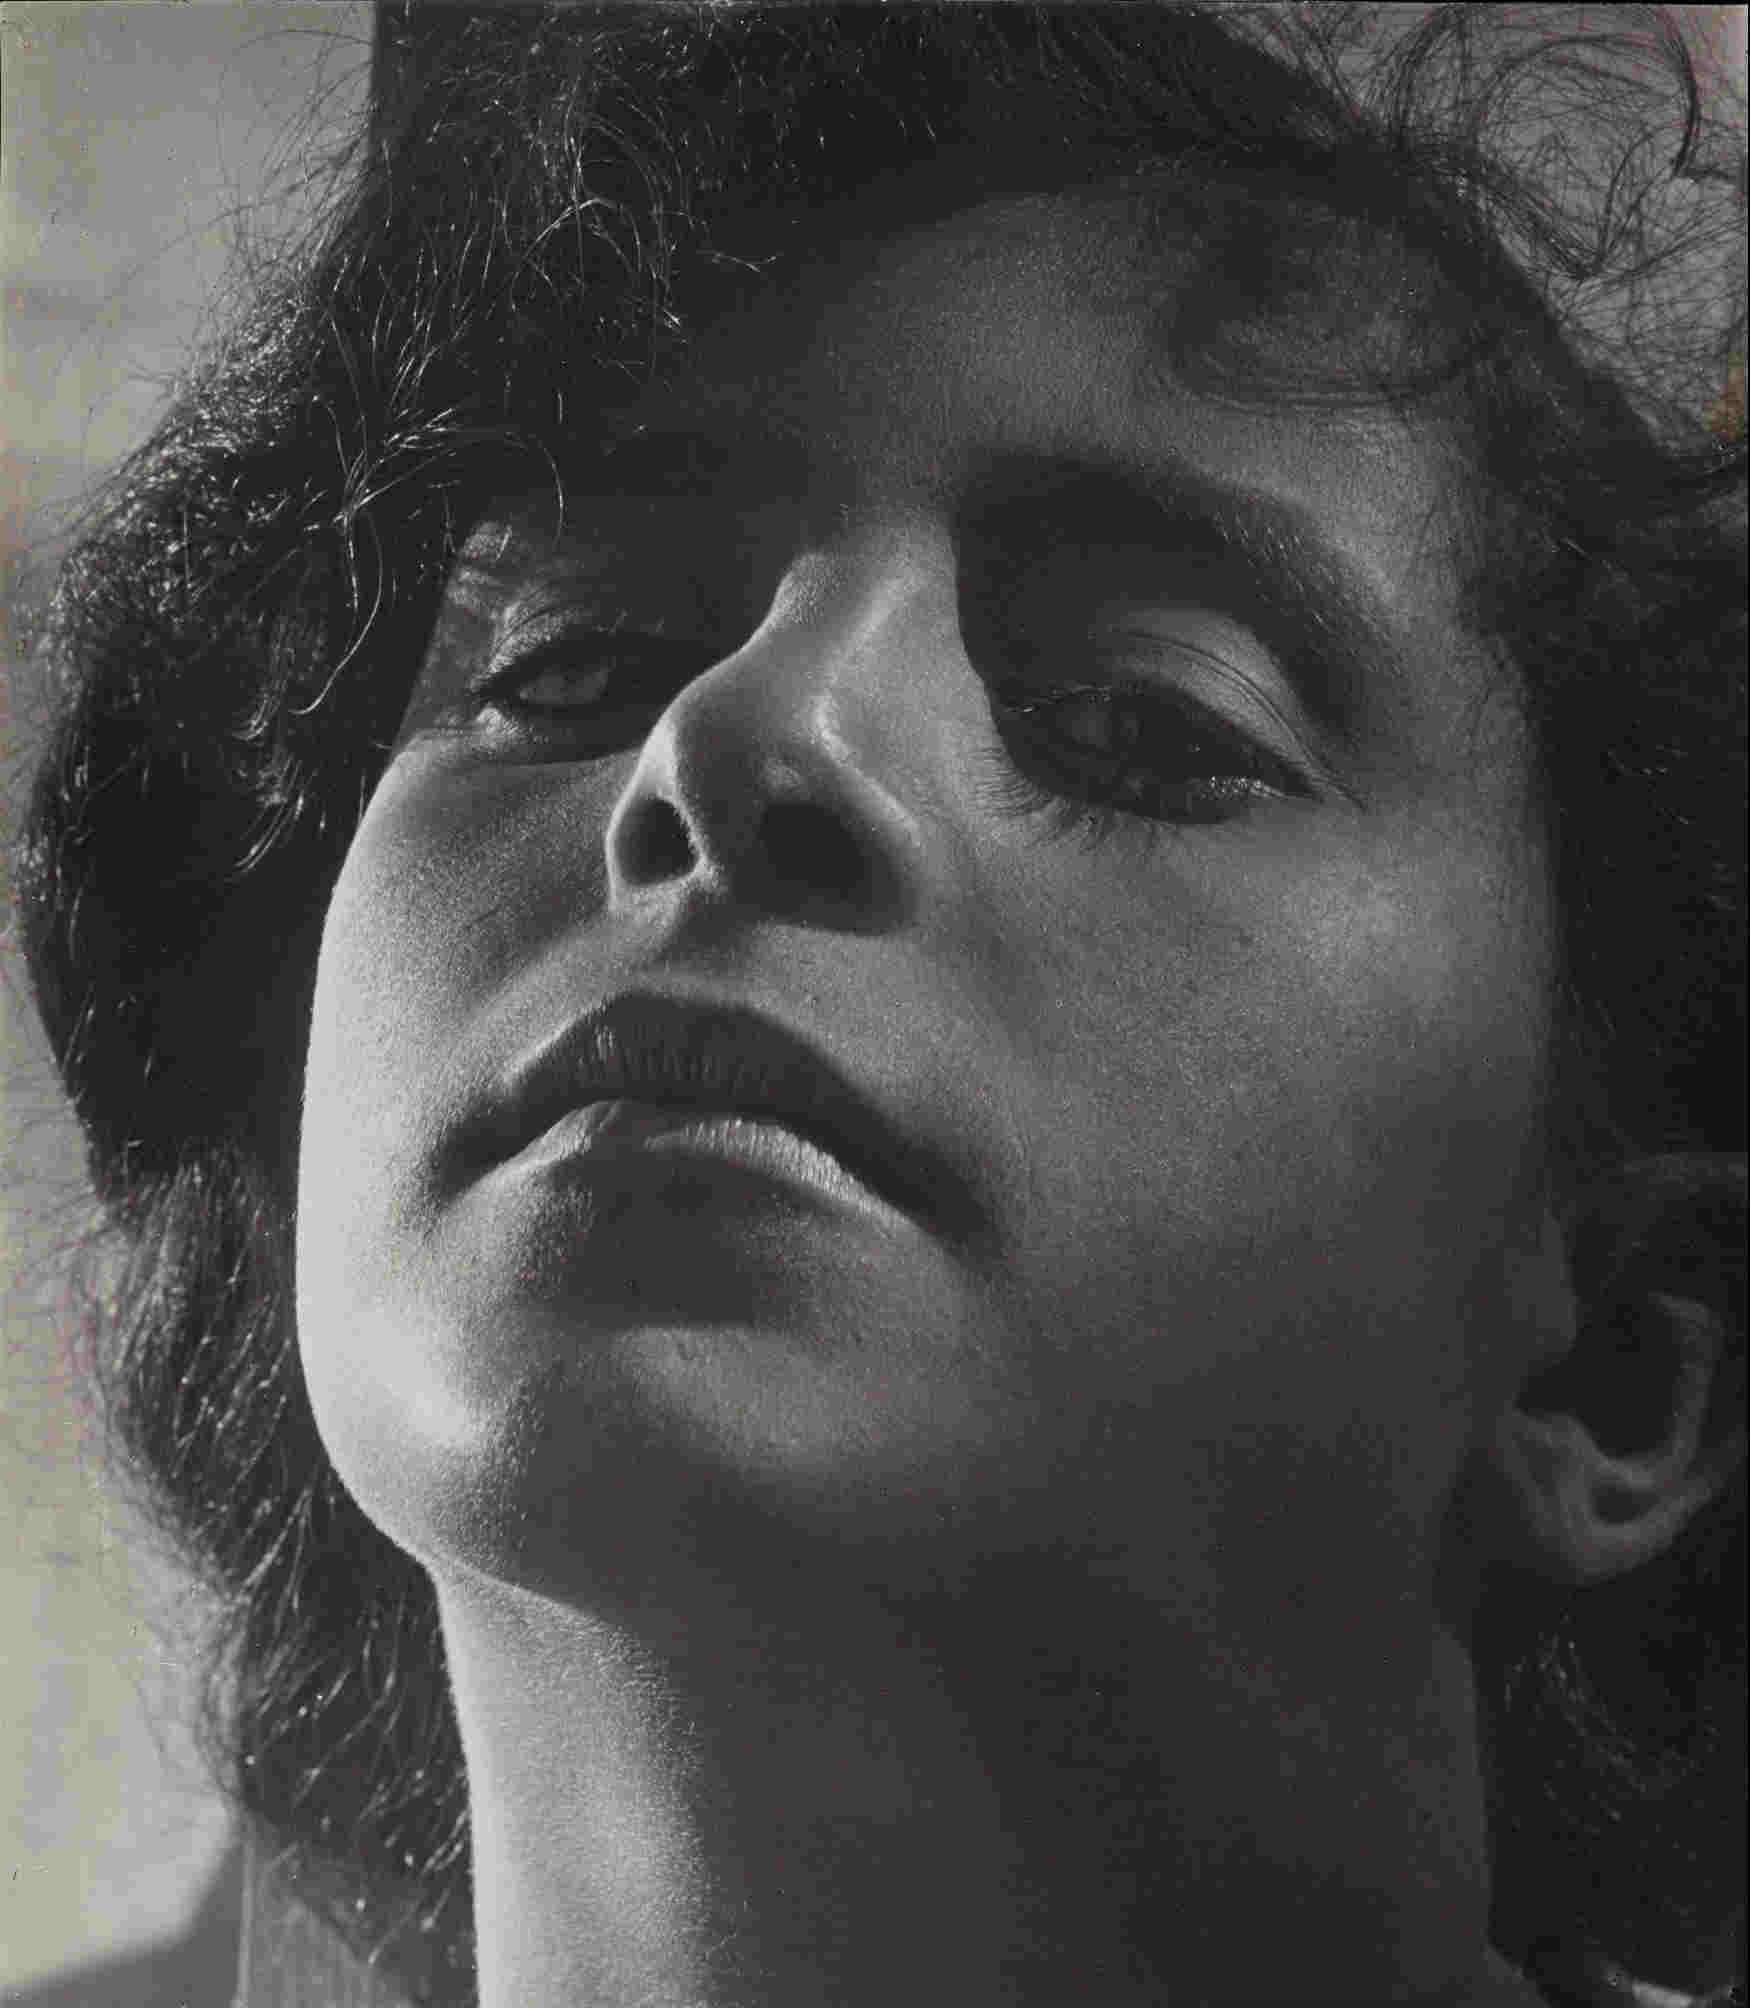 Juive yéménite Helmar Lerski MAHJ